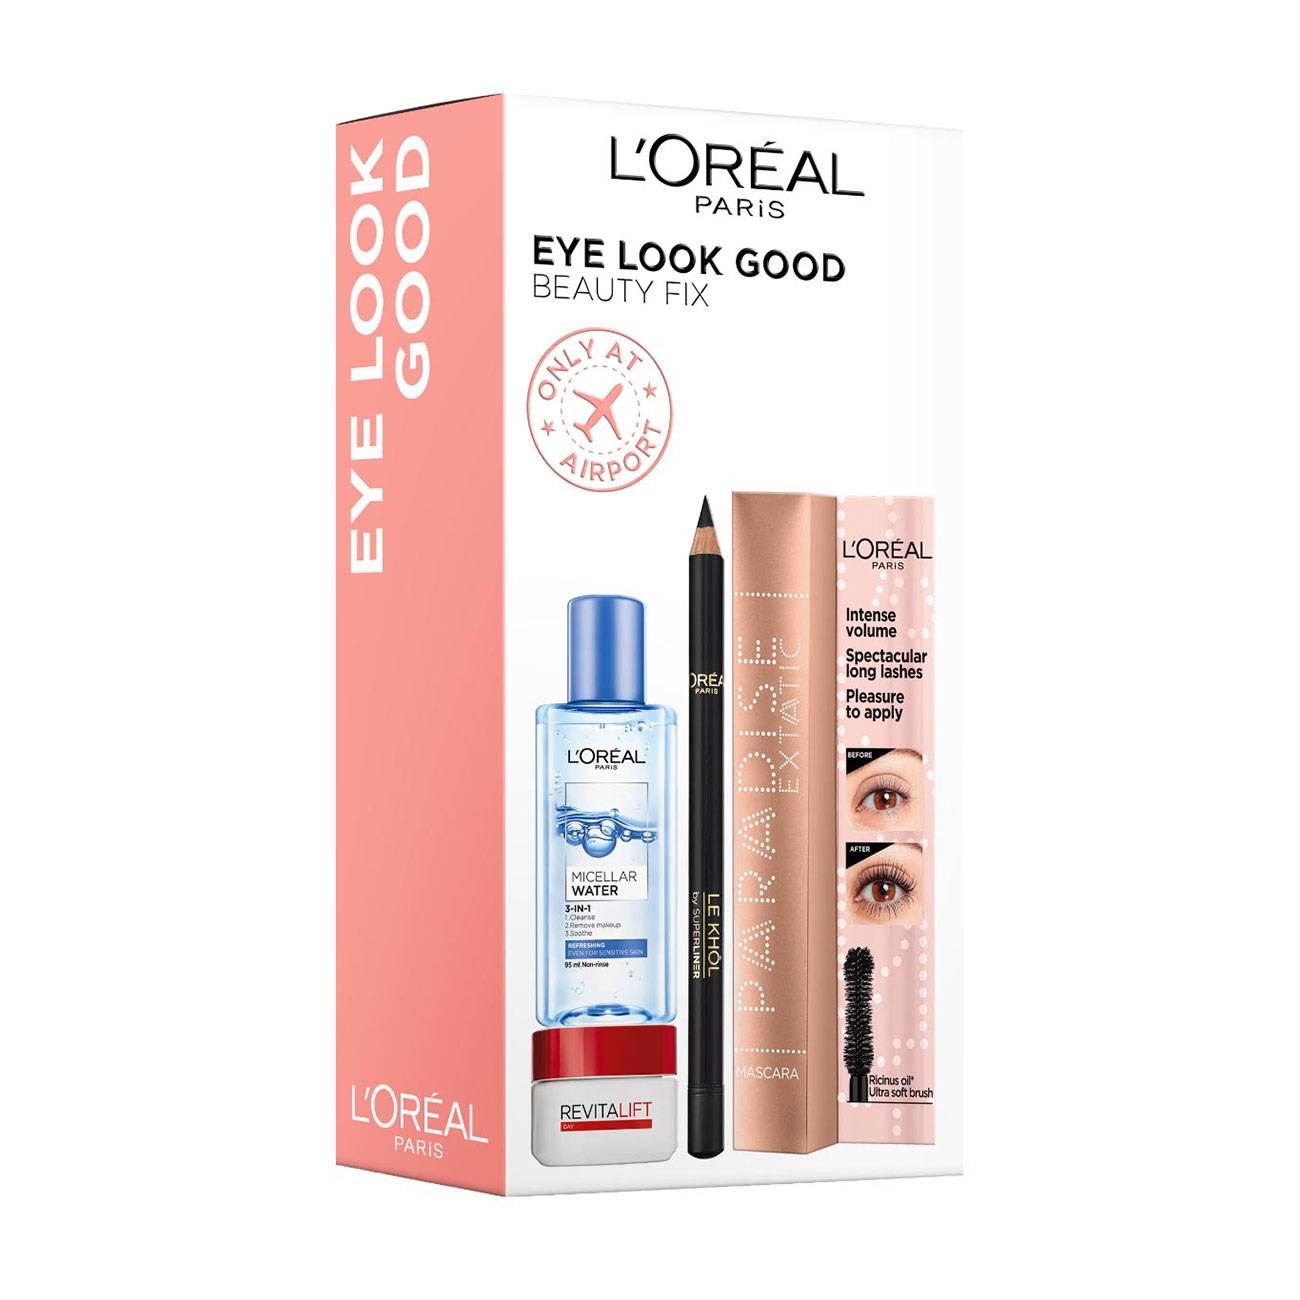 Eye Look Good Beauty Fix Set 117ml L'Oreal imagine 2021 bestvalue.eu